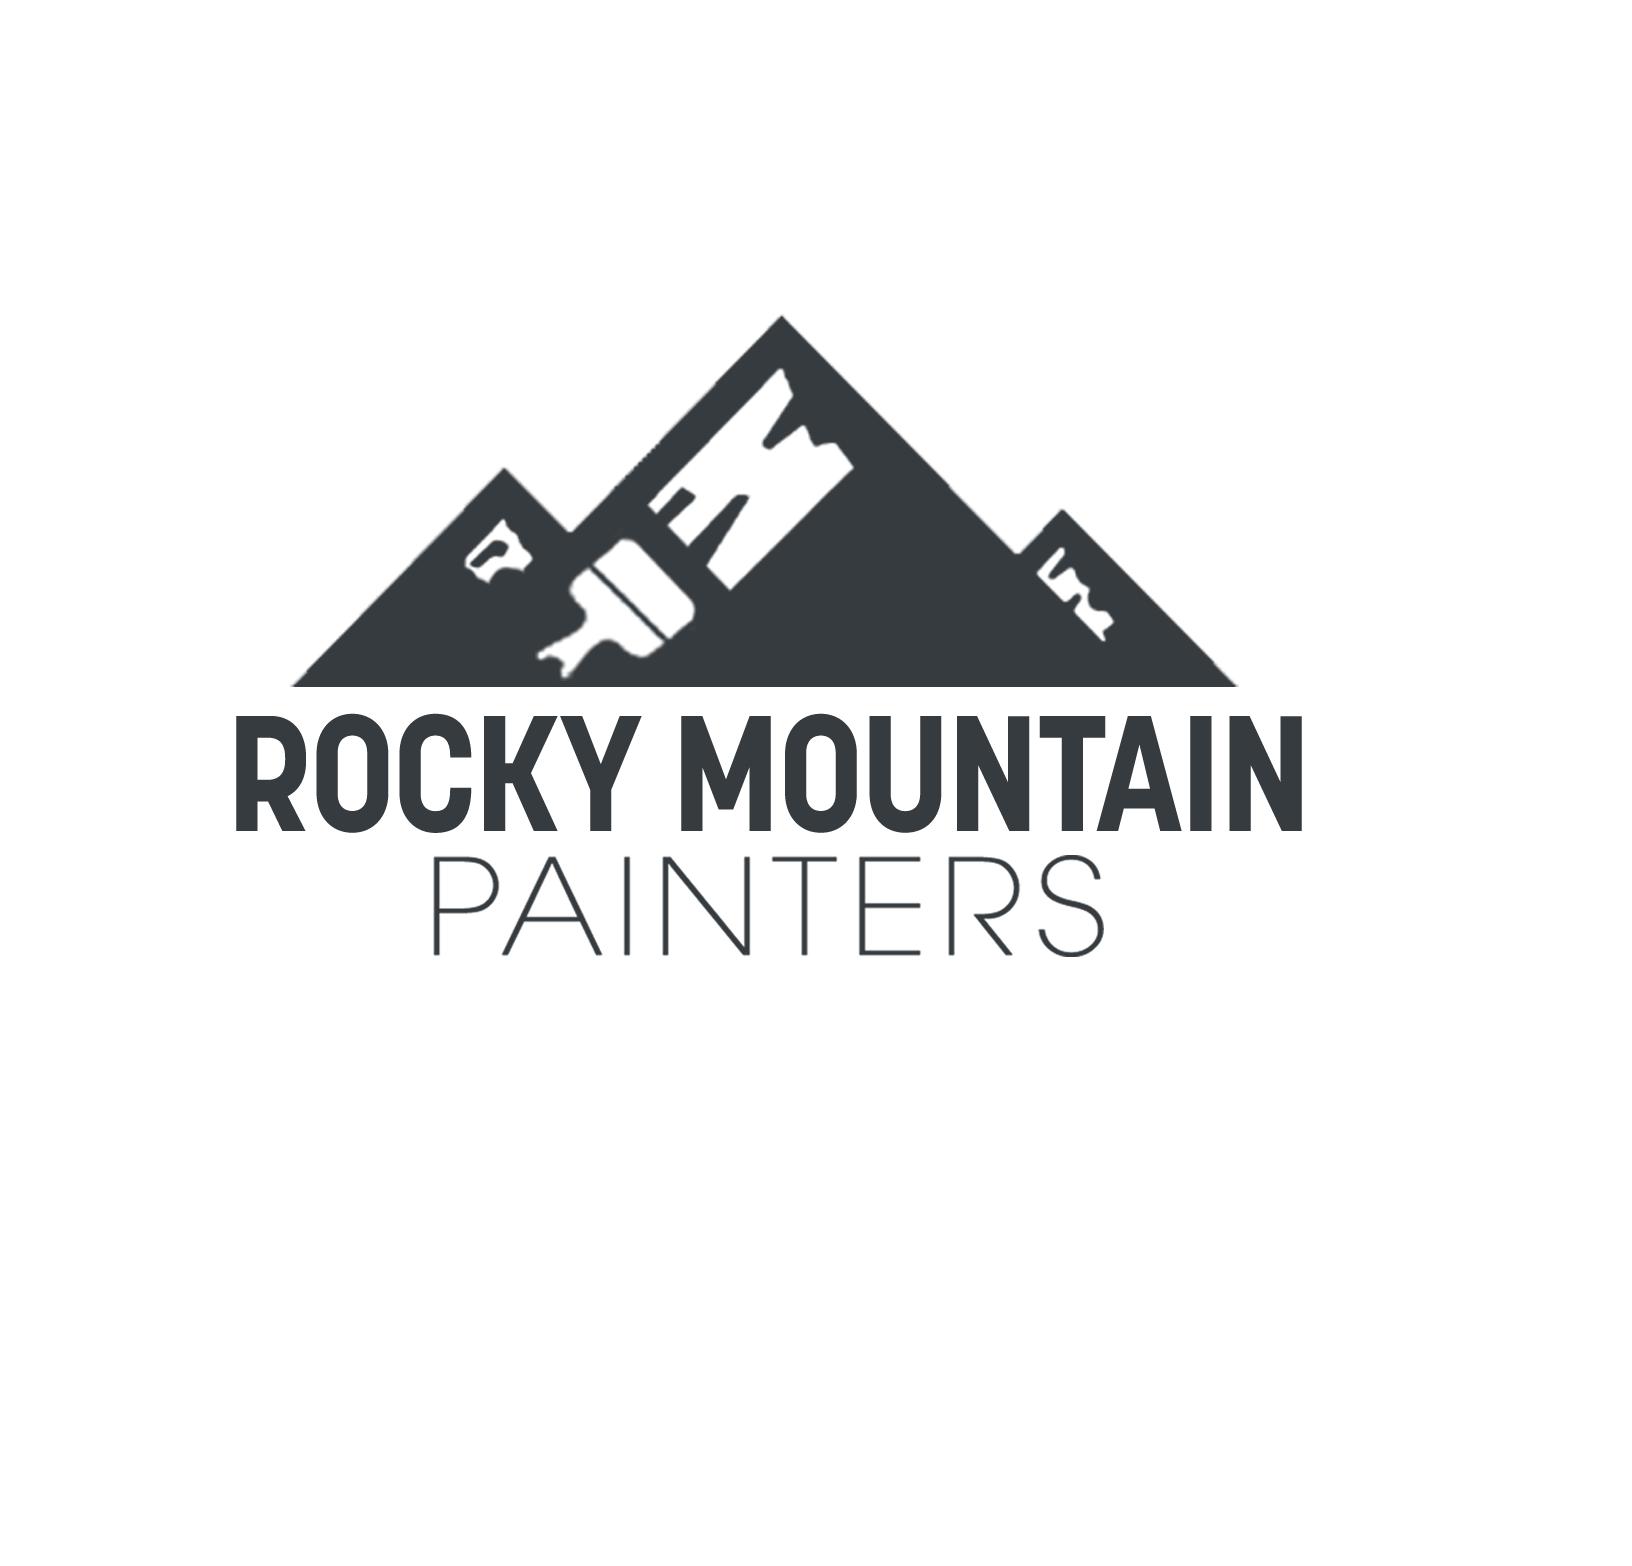 Rocky Mountain Painters Reviews - Bountiful, UT